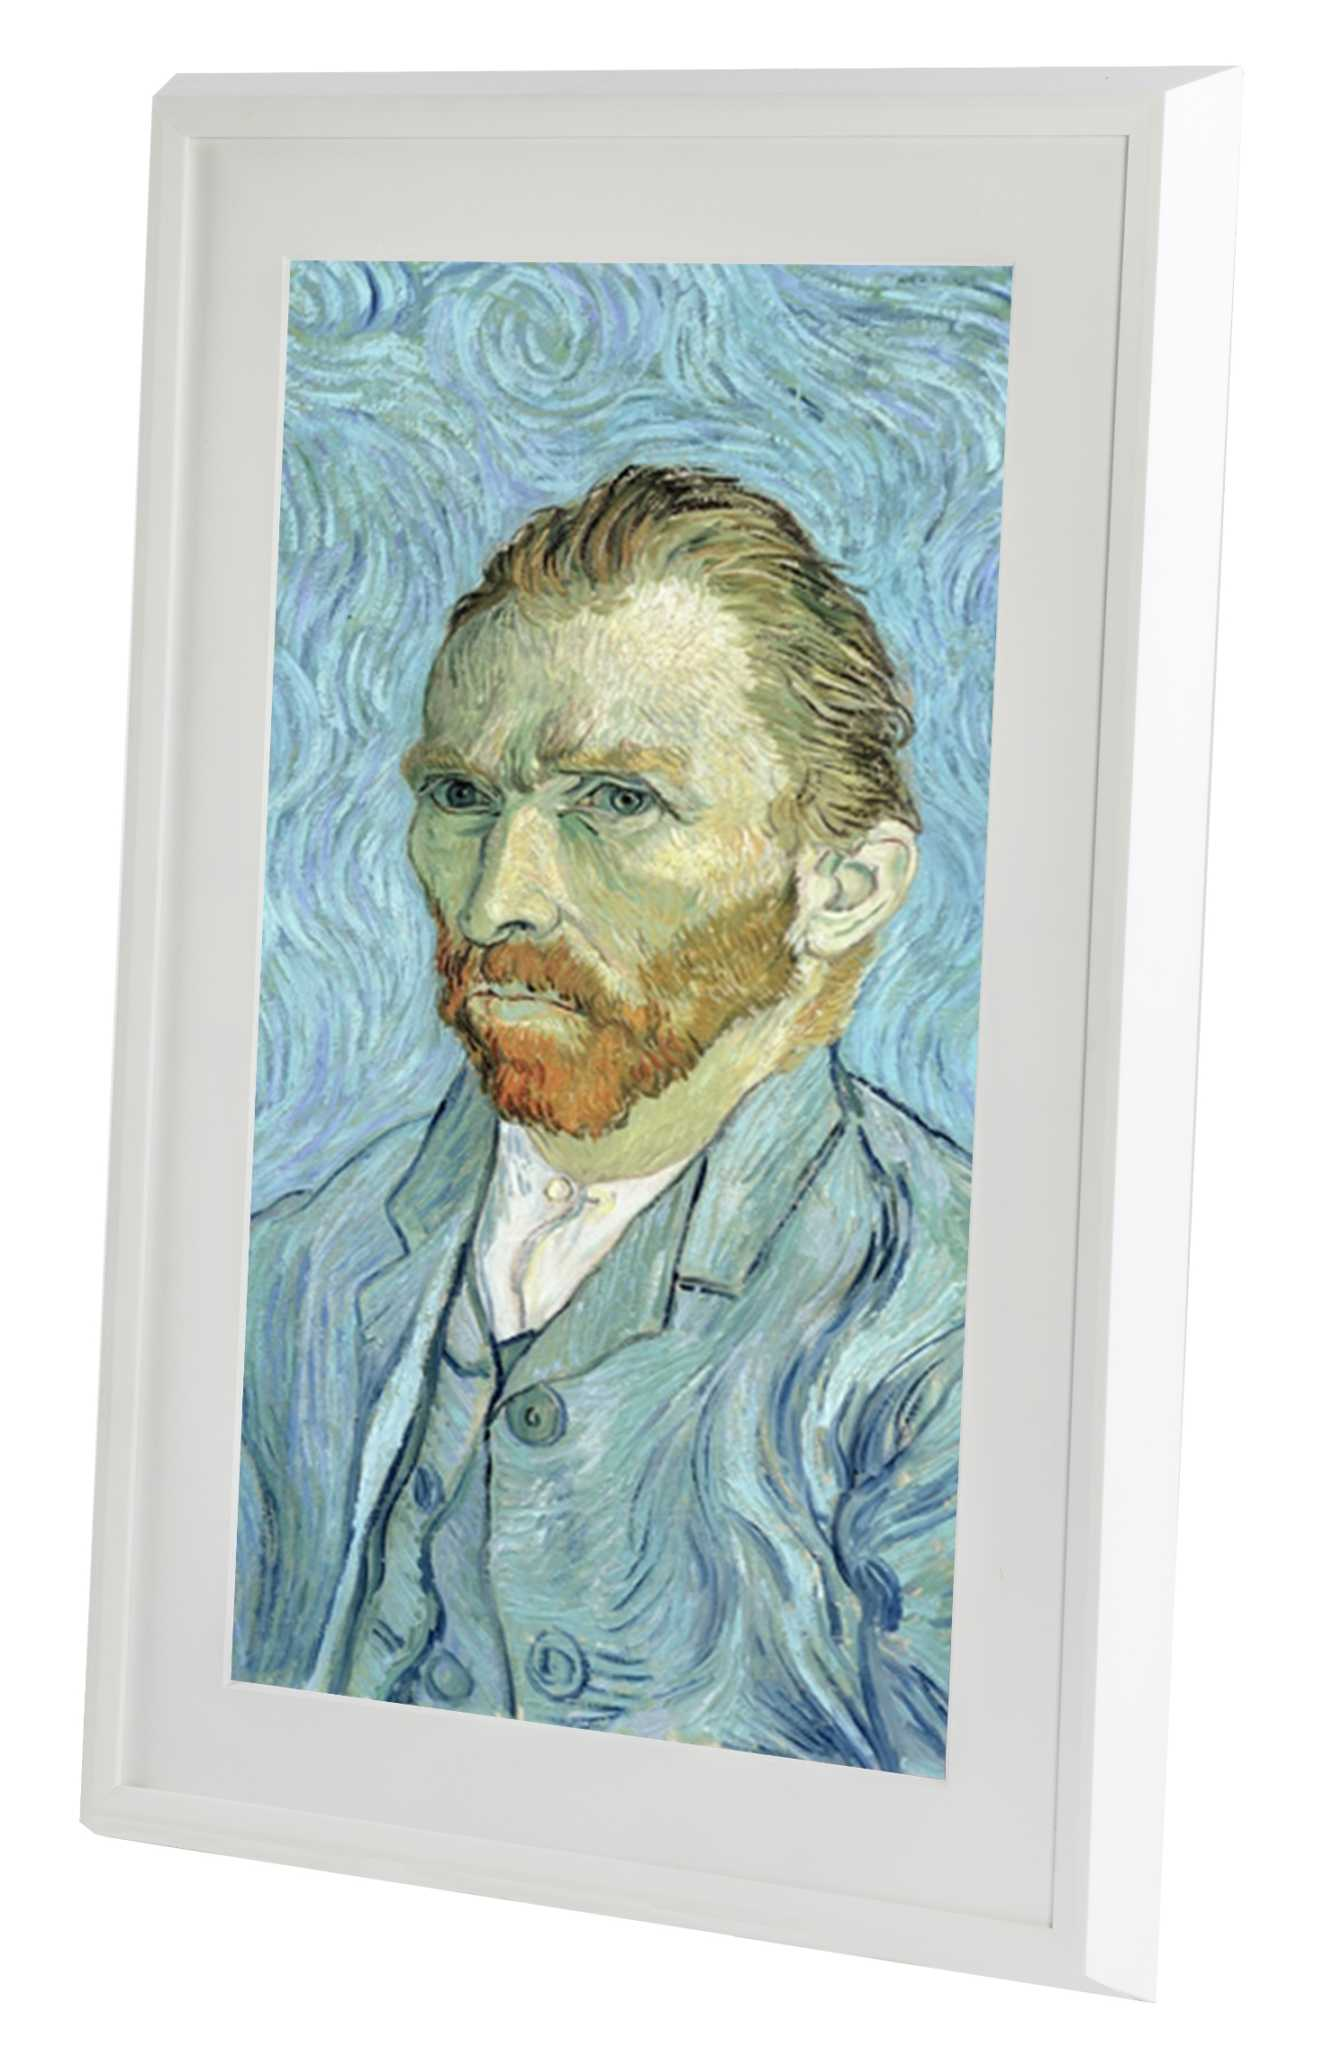 NETGEAR Meural Canvas_White frame